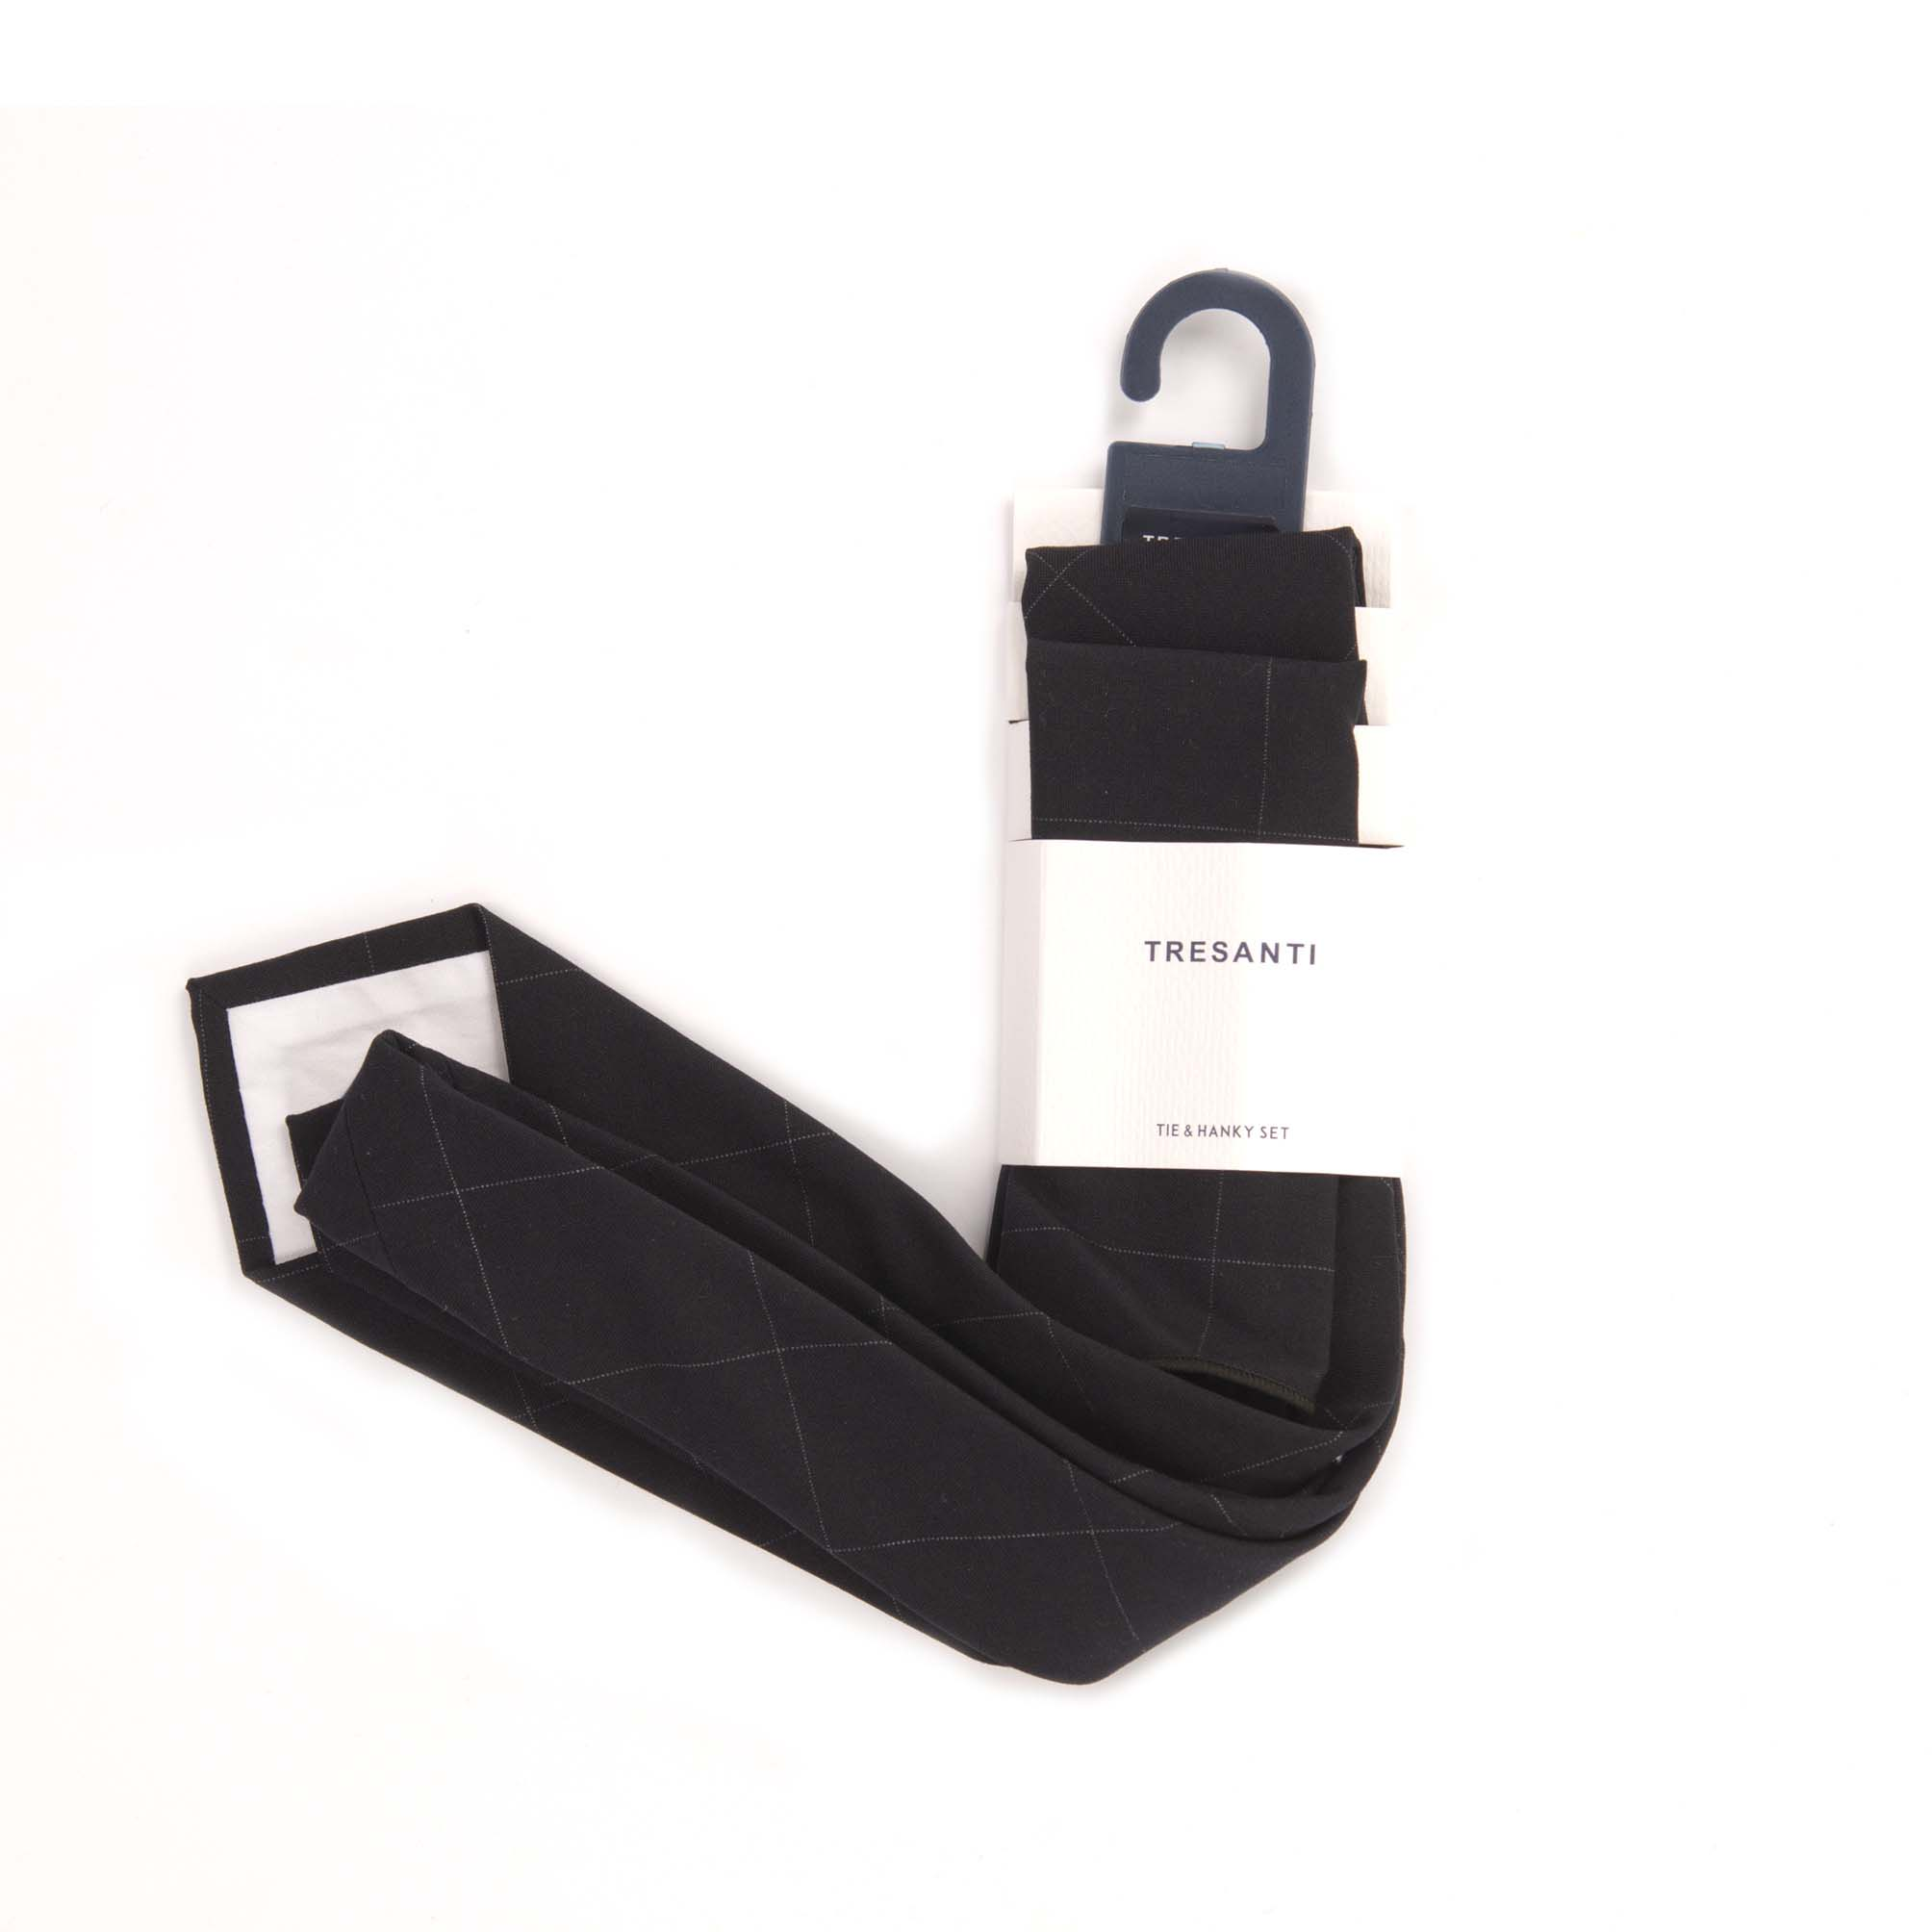 Tie & hanky set black with diamonds